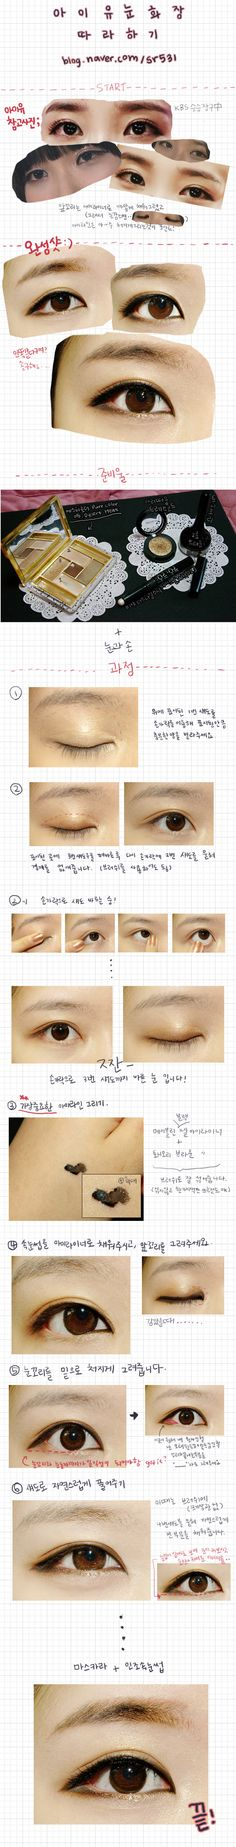 Korean Makeup  www.piccassobeauty.net Professional Korean Eyelashes and Brushes Korean Makeup